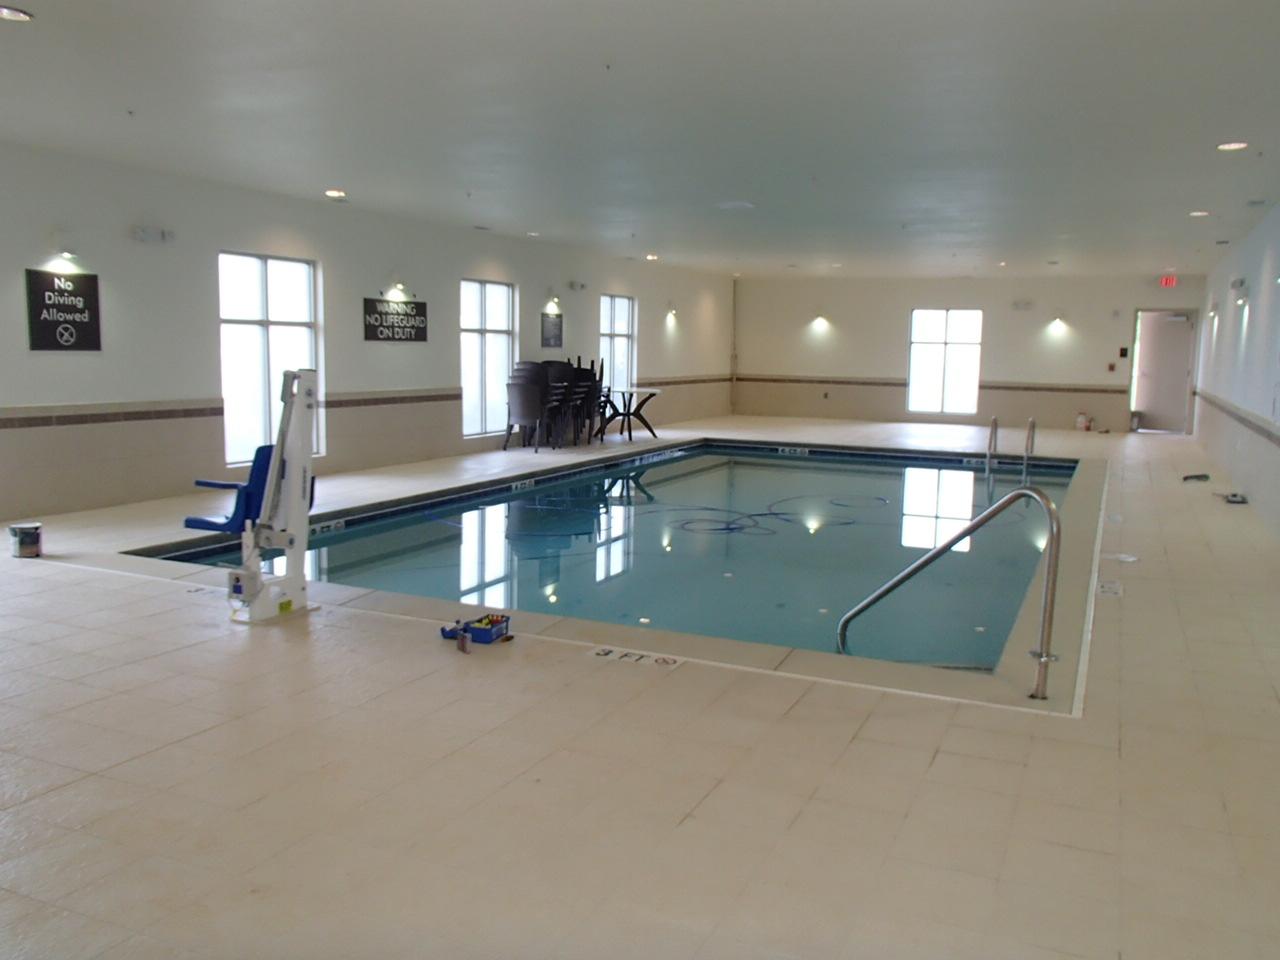 Sleep Inn Emerson Georgia swimming pool